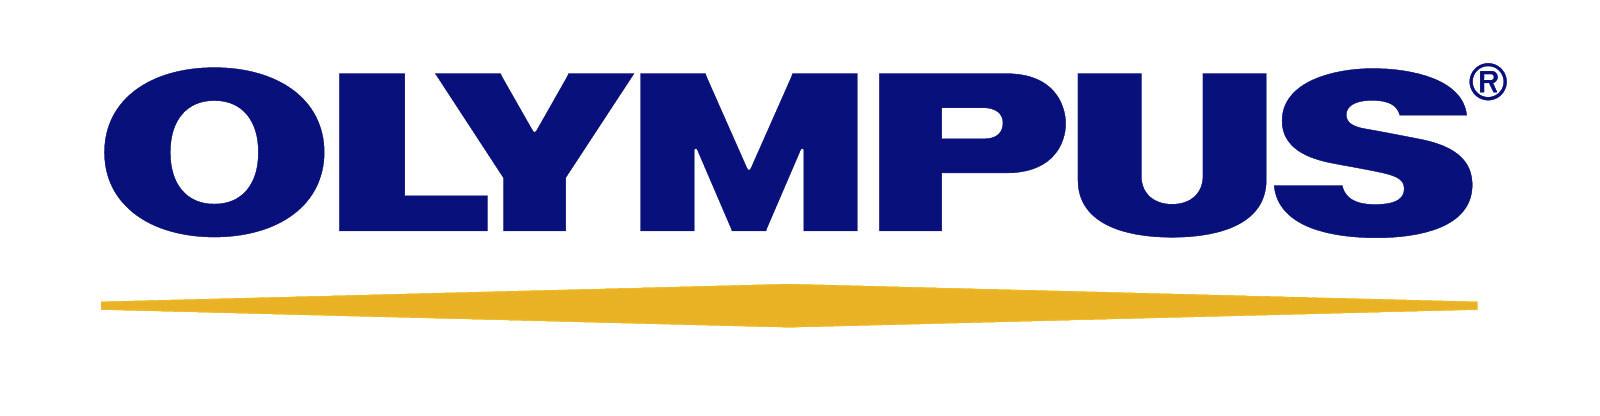 Olympus runs the website using magento web development